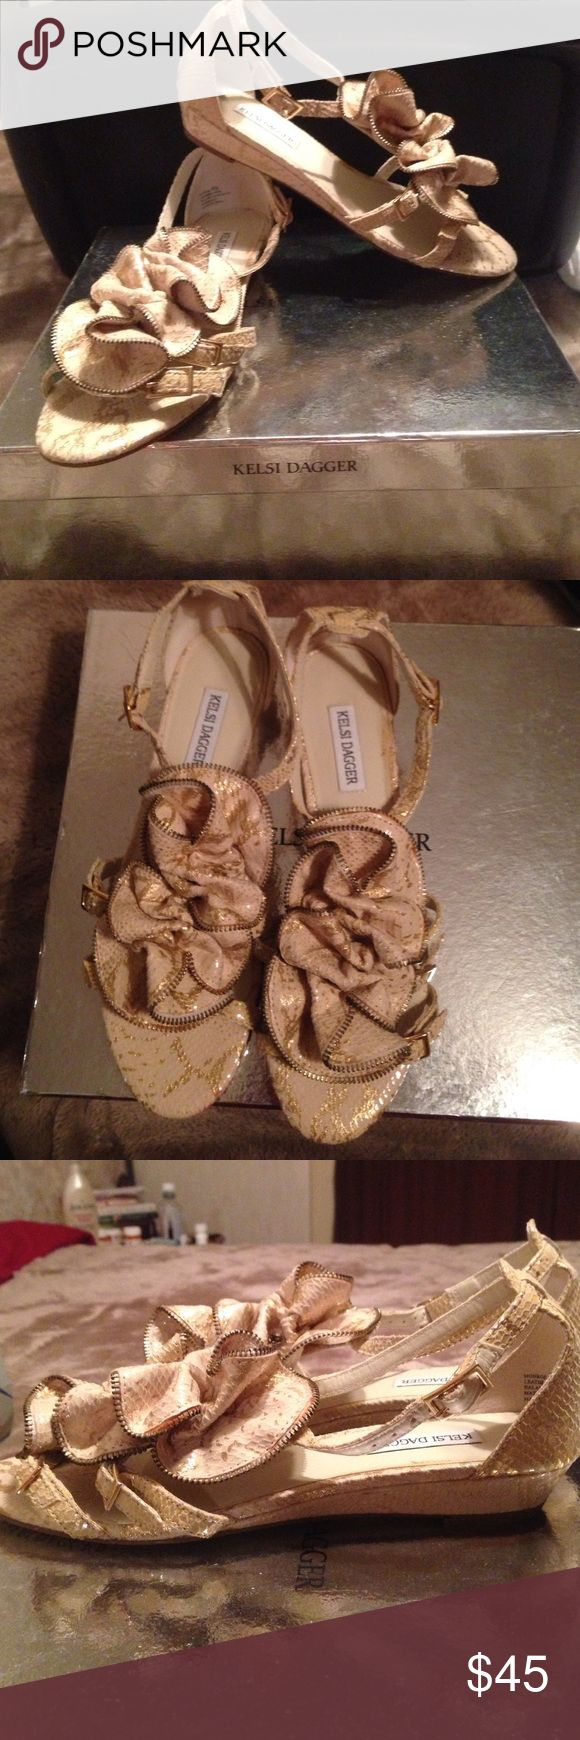 Kelsi Dagger Monroe sandal Very cute gold, snake print sandal! Only worn a couple times! Slight heel but still comfortable Kelsi Dagger Shoes Sandals